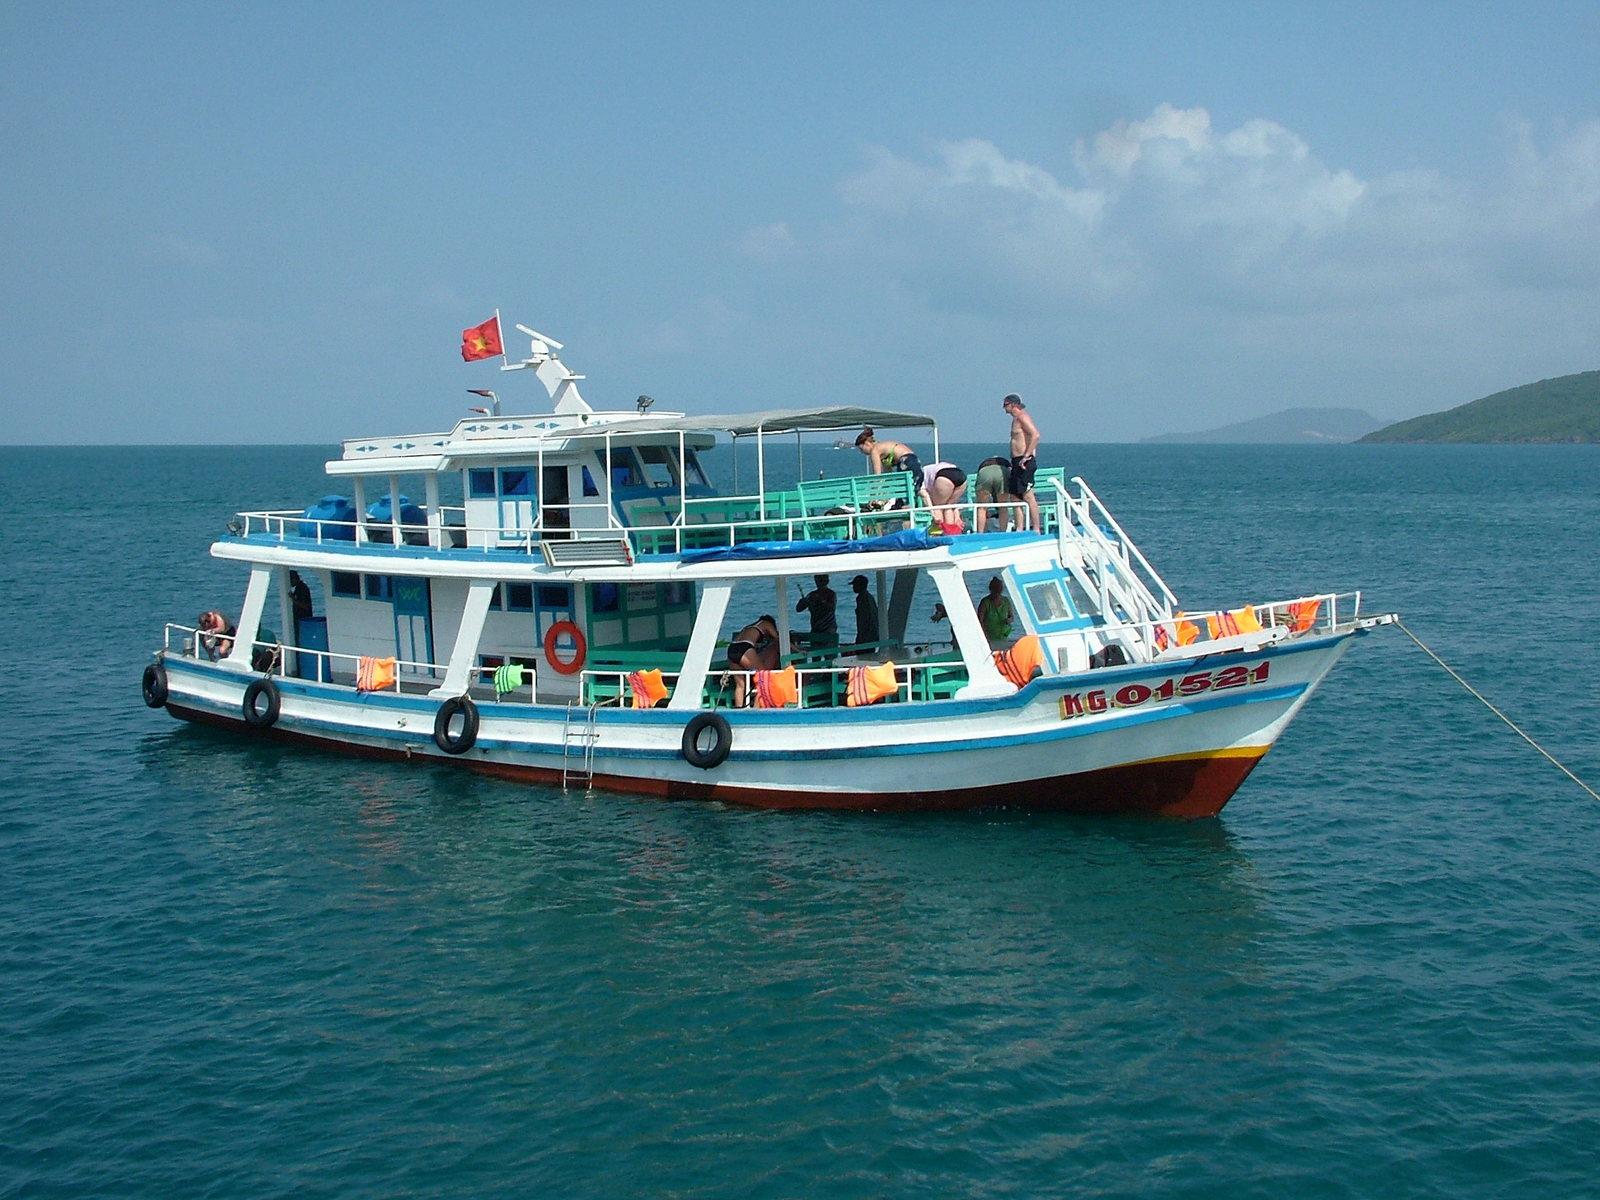 Di lai 5736 1525677275 2230 1543551123 - Phu Quoc travel experience